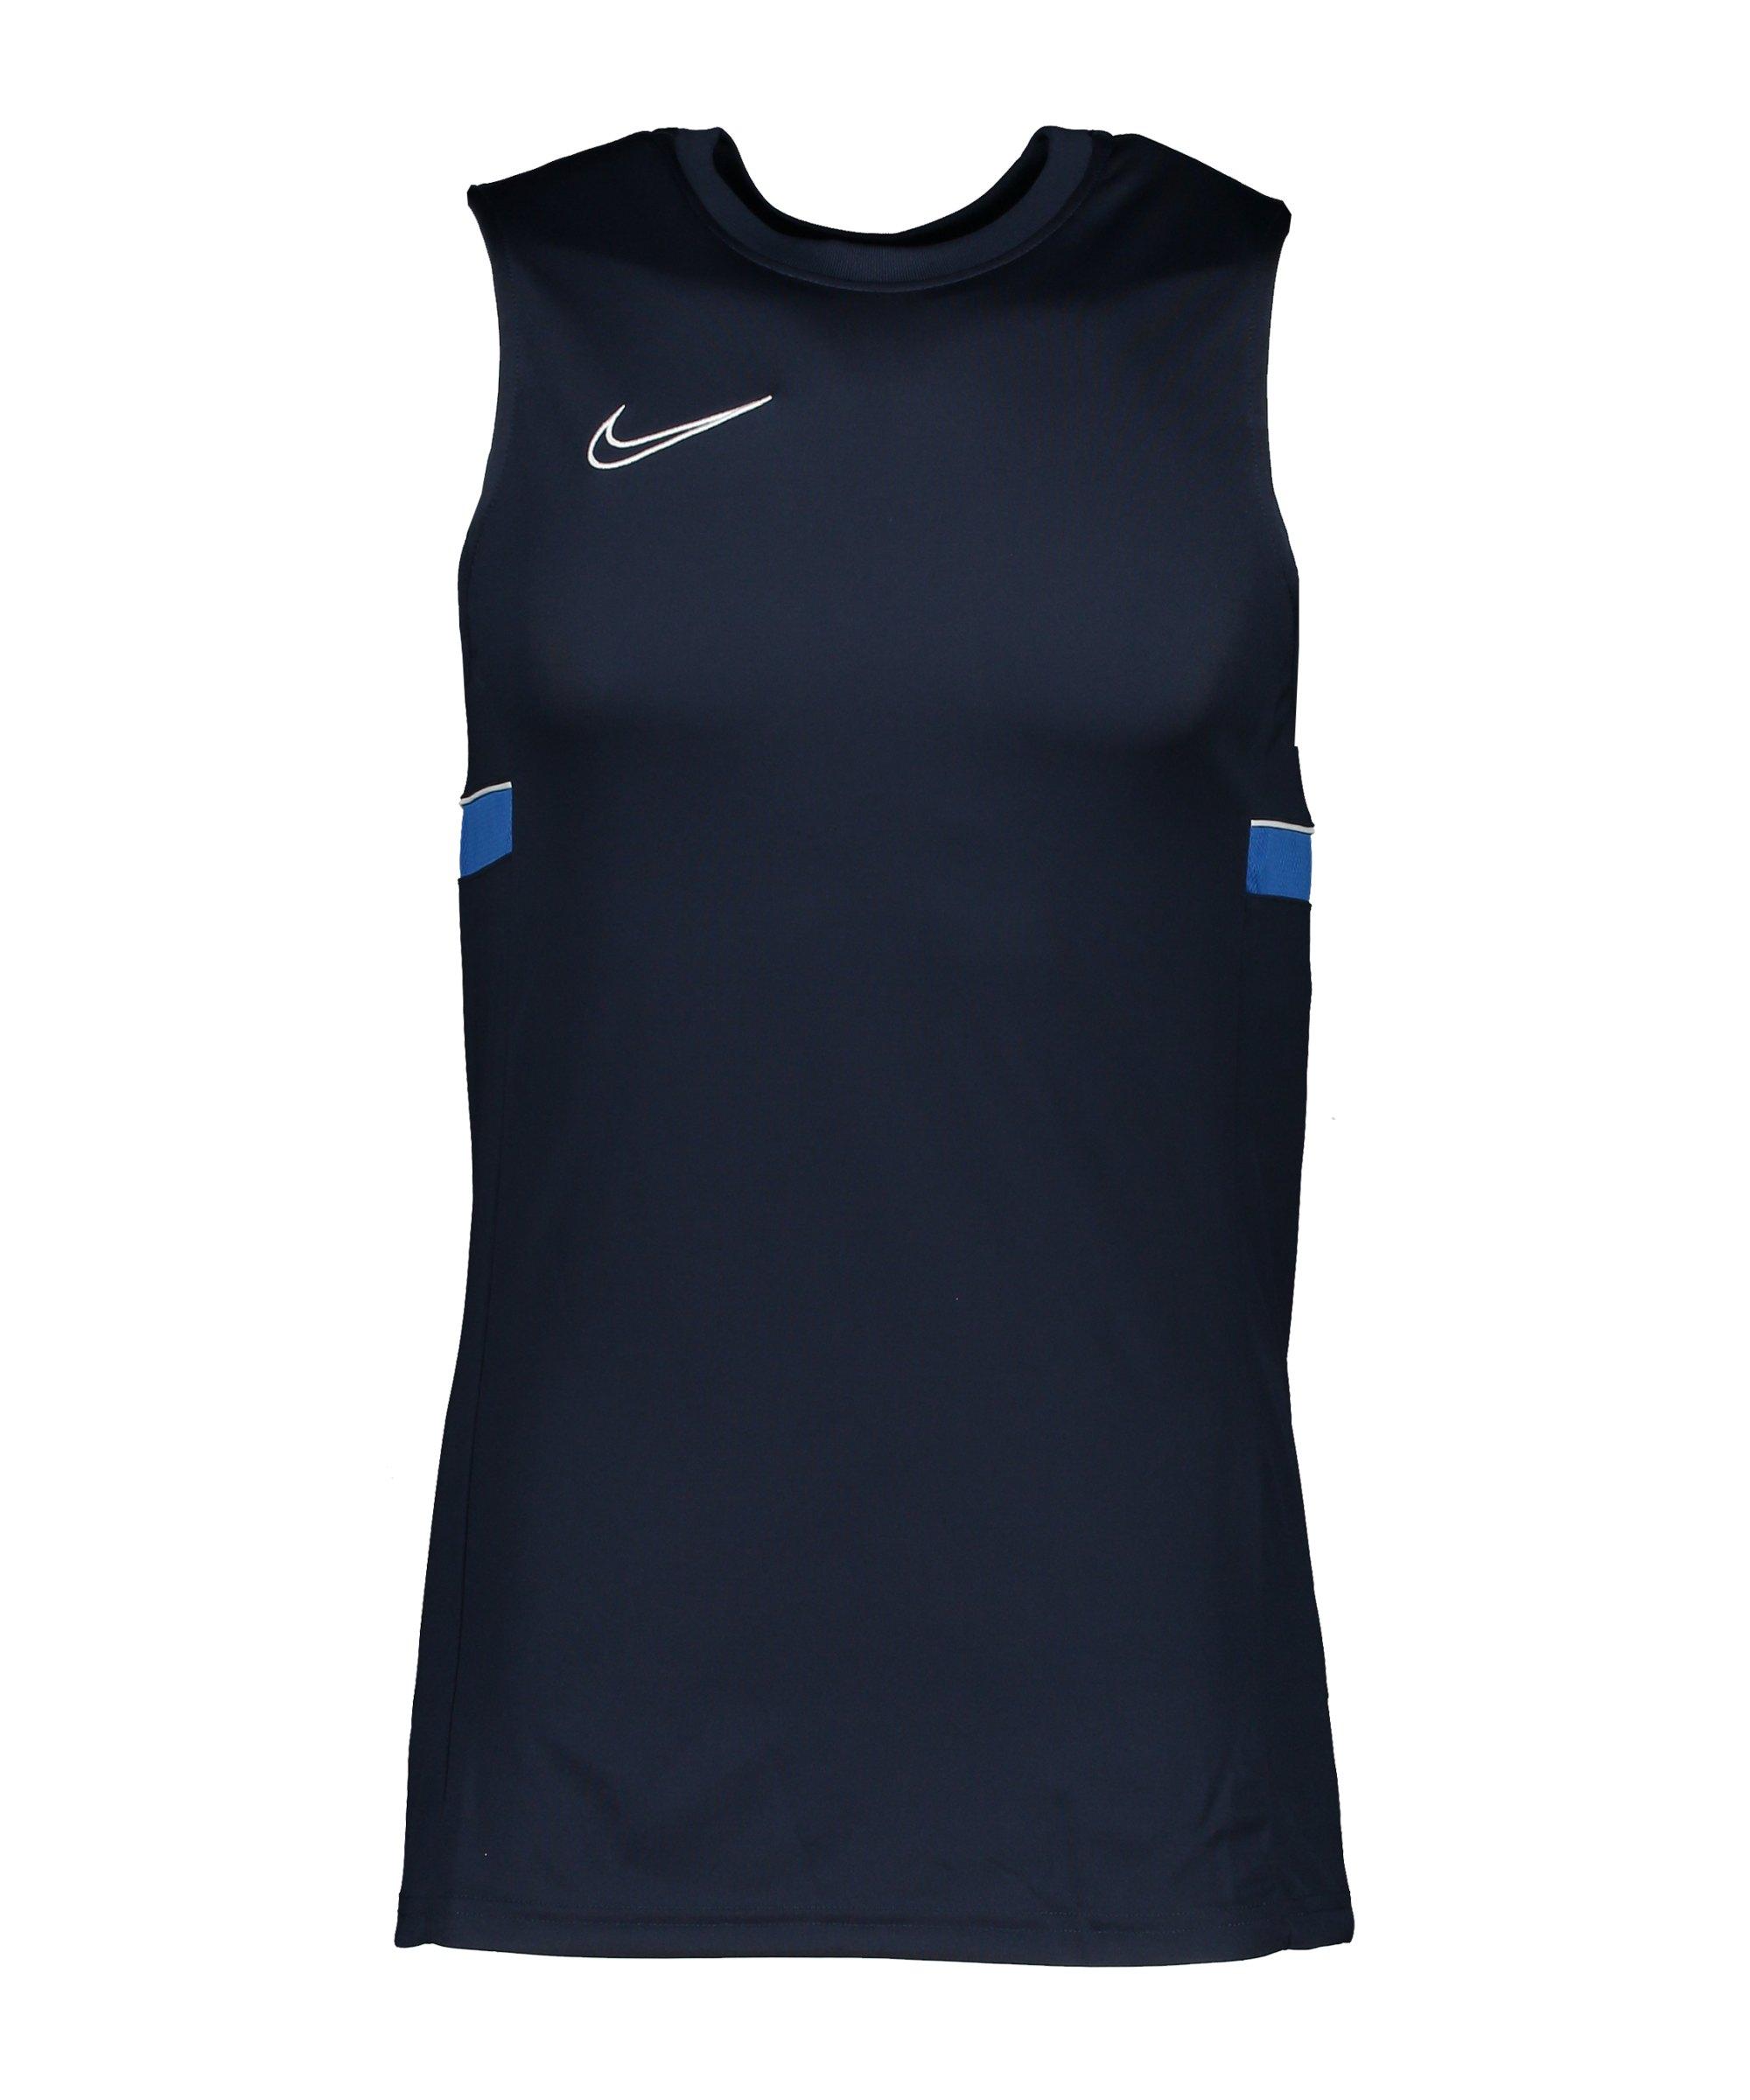 Nike Academy 21 Tanktop Kids Blau Weiss F453 - blau